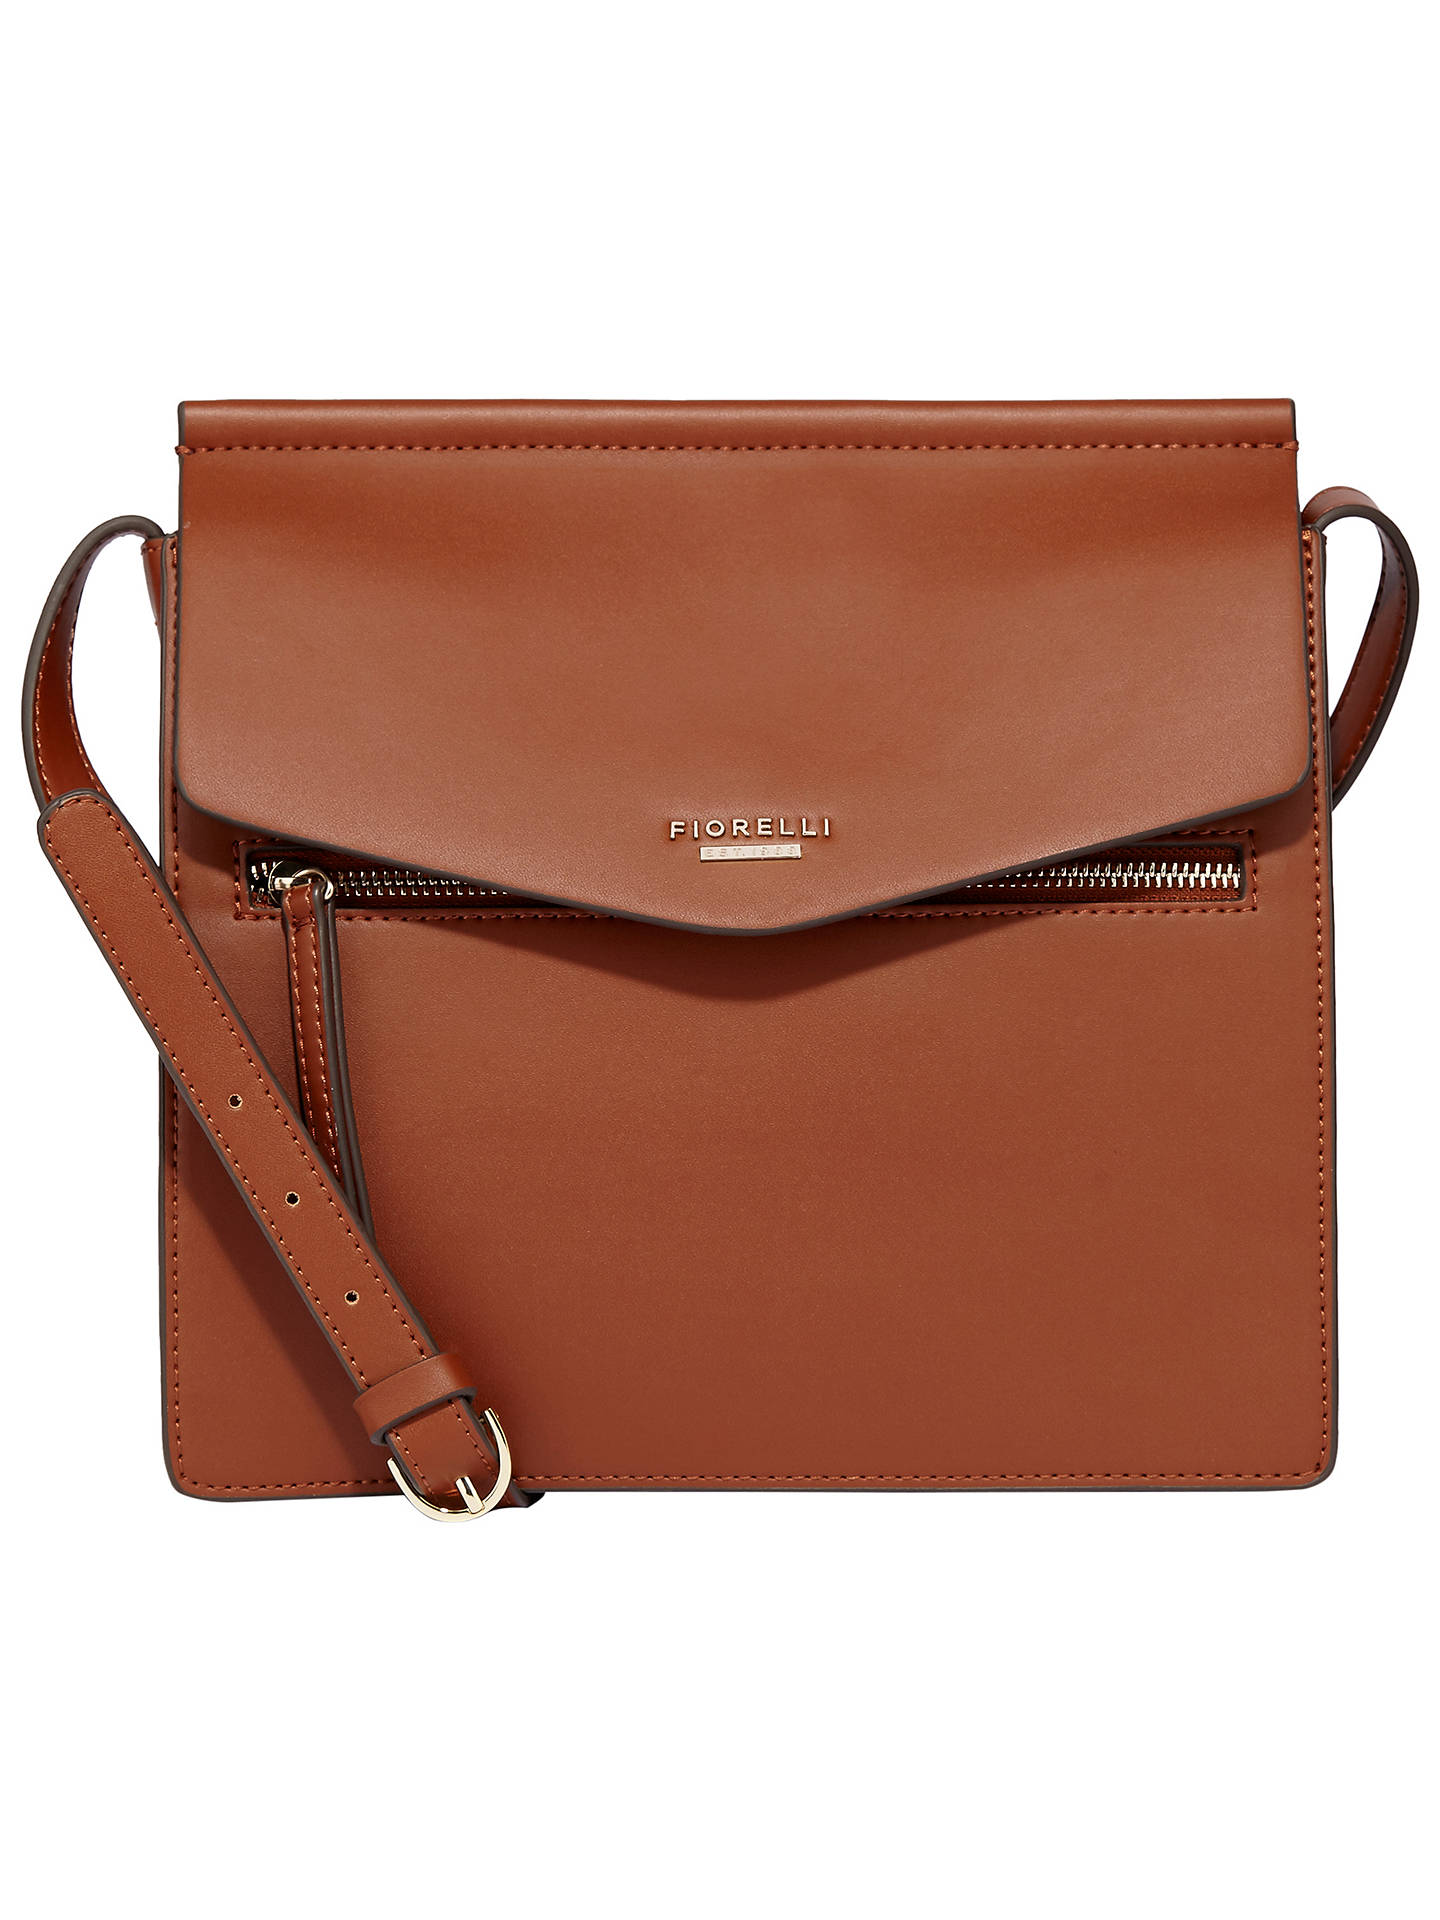 Fiorelli Mia Large Across Body Bag Tan Online At Johnlewis